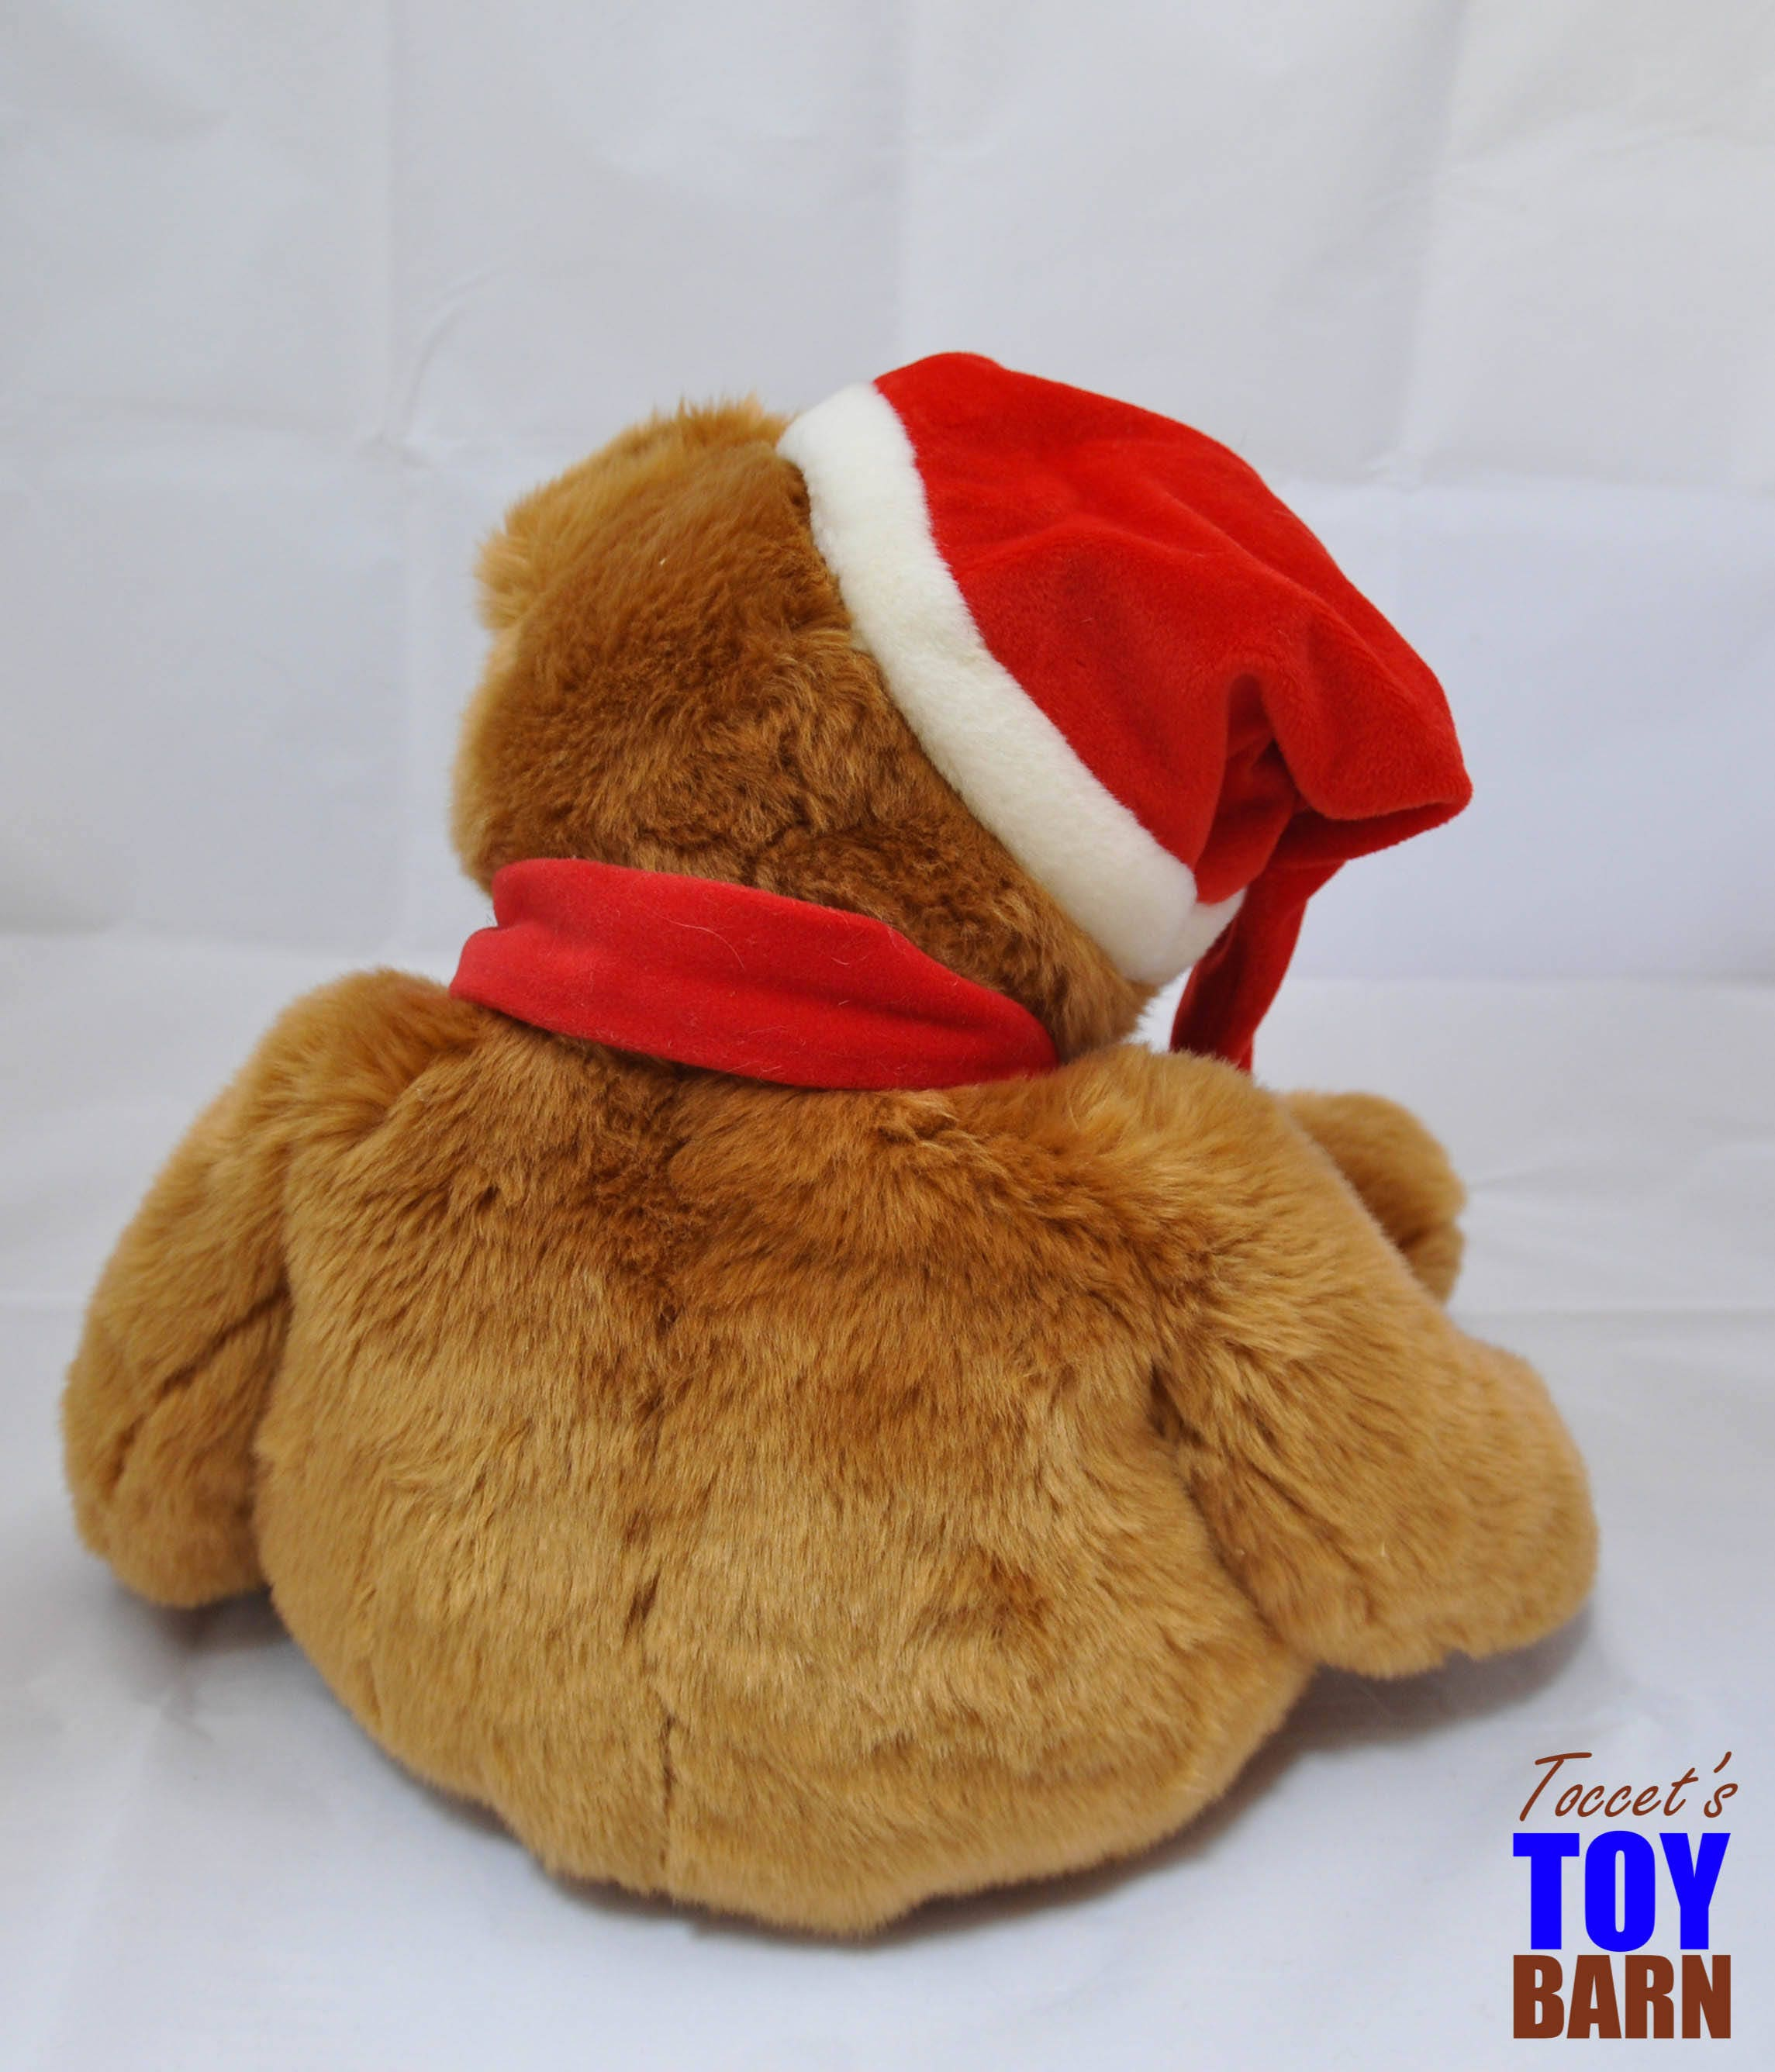 691c8da00835 Vintage 1997 Ty Large Christmas Holiday Plush Beanie Buddy Teddy ...